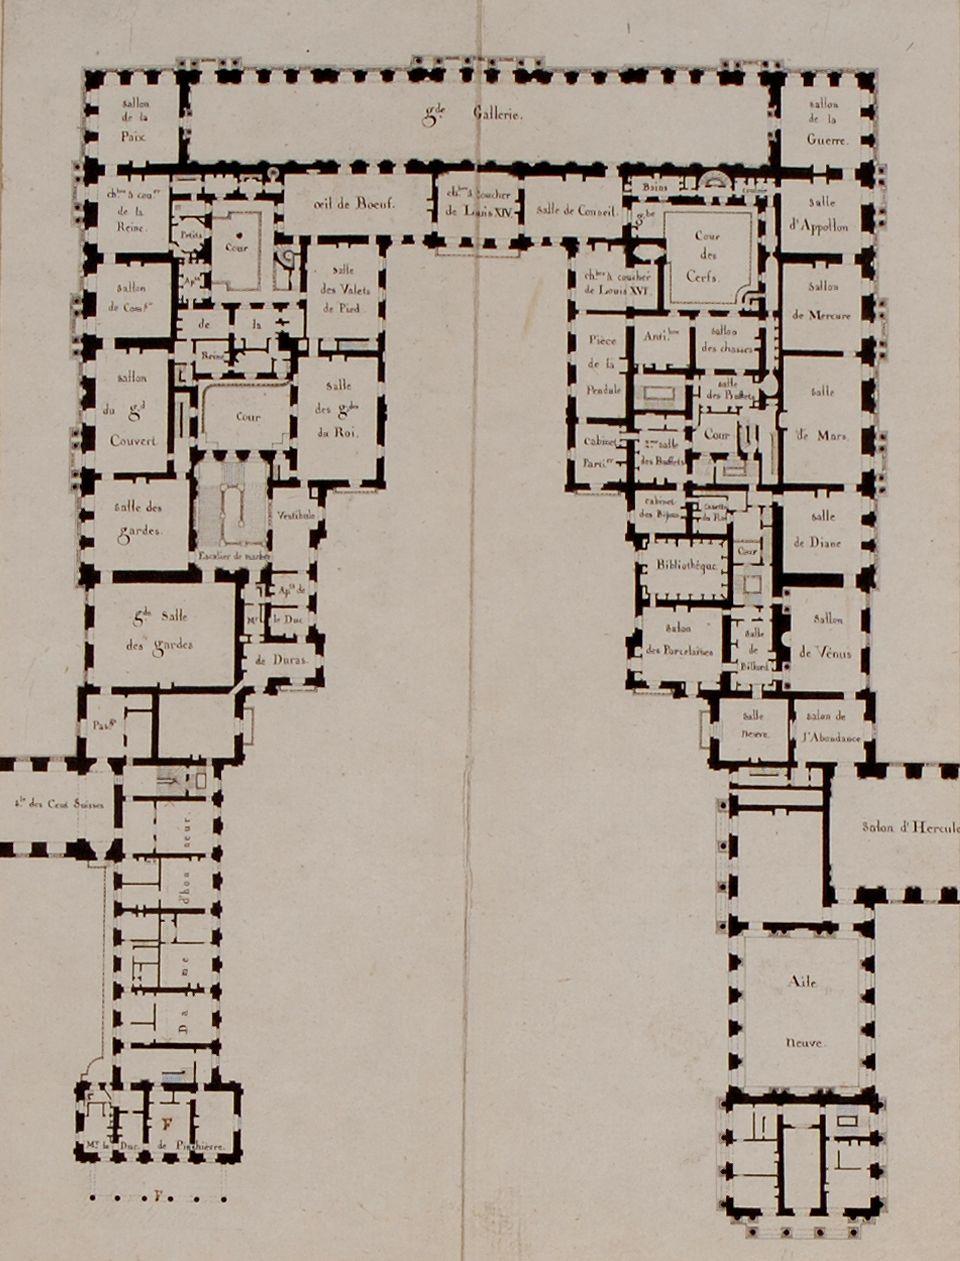 first floor plan chateau de versailles 1814 it shows the pre first floor plan chateau de versailles 1814 it shows the pre